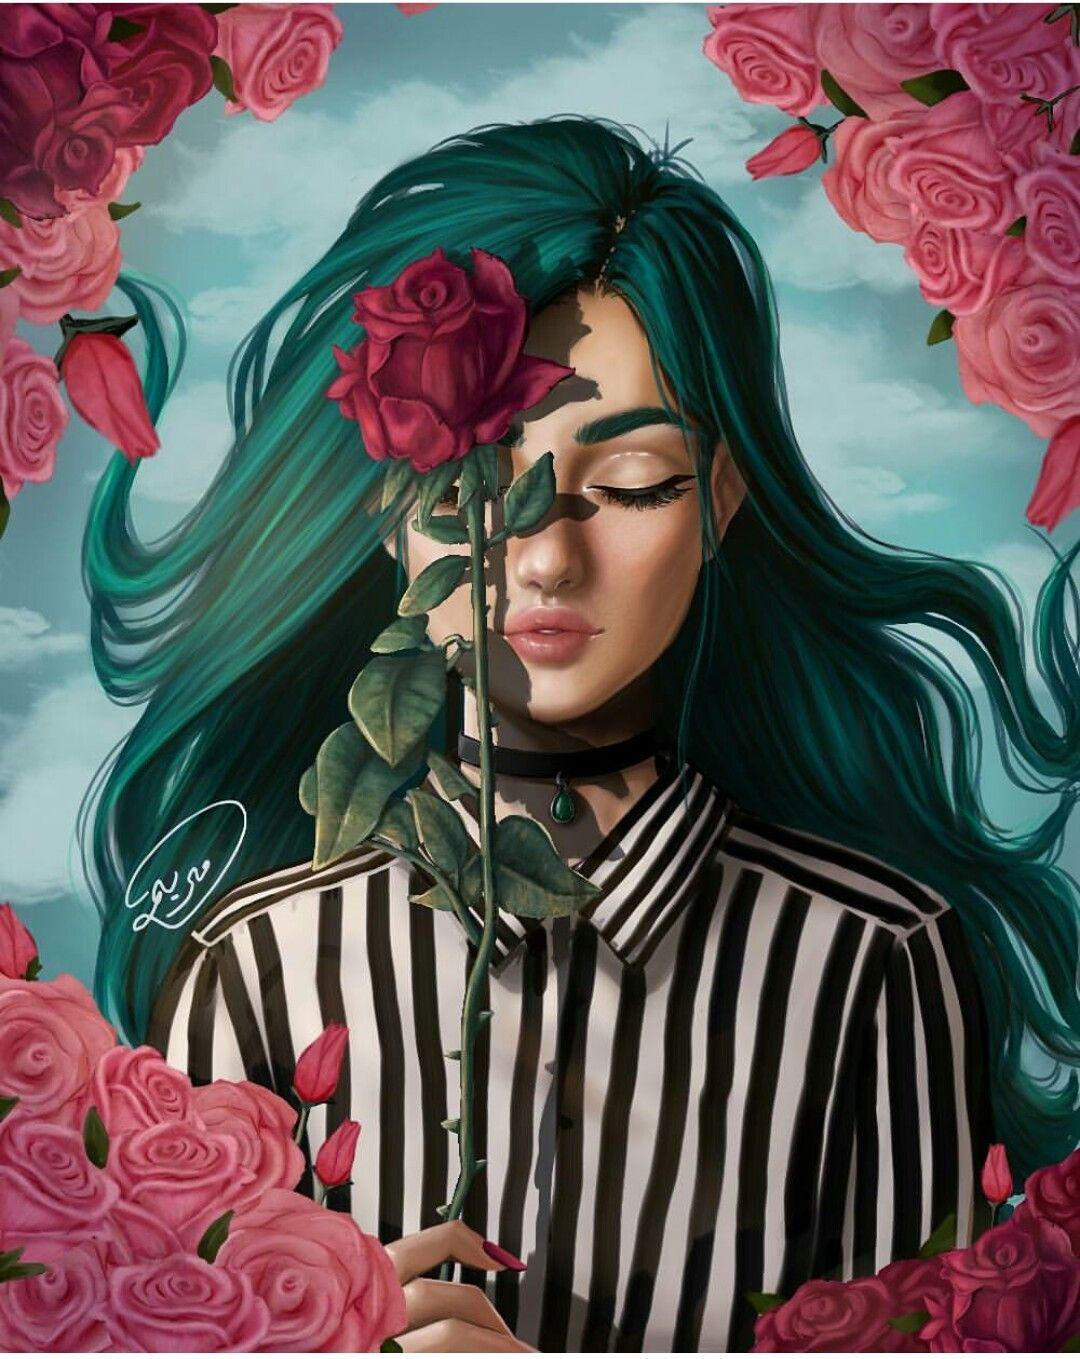 Girly_m   Art   Pinterest   Fondos, Dibujo y Fondos de pantalla